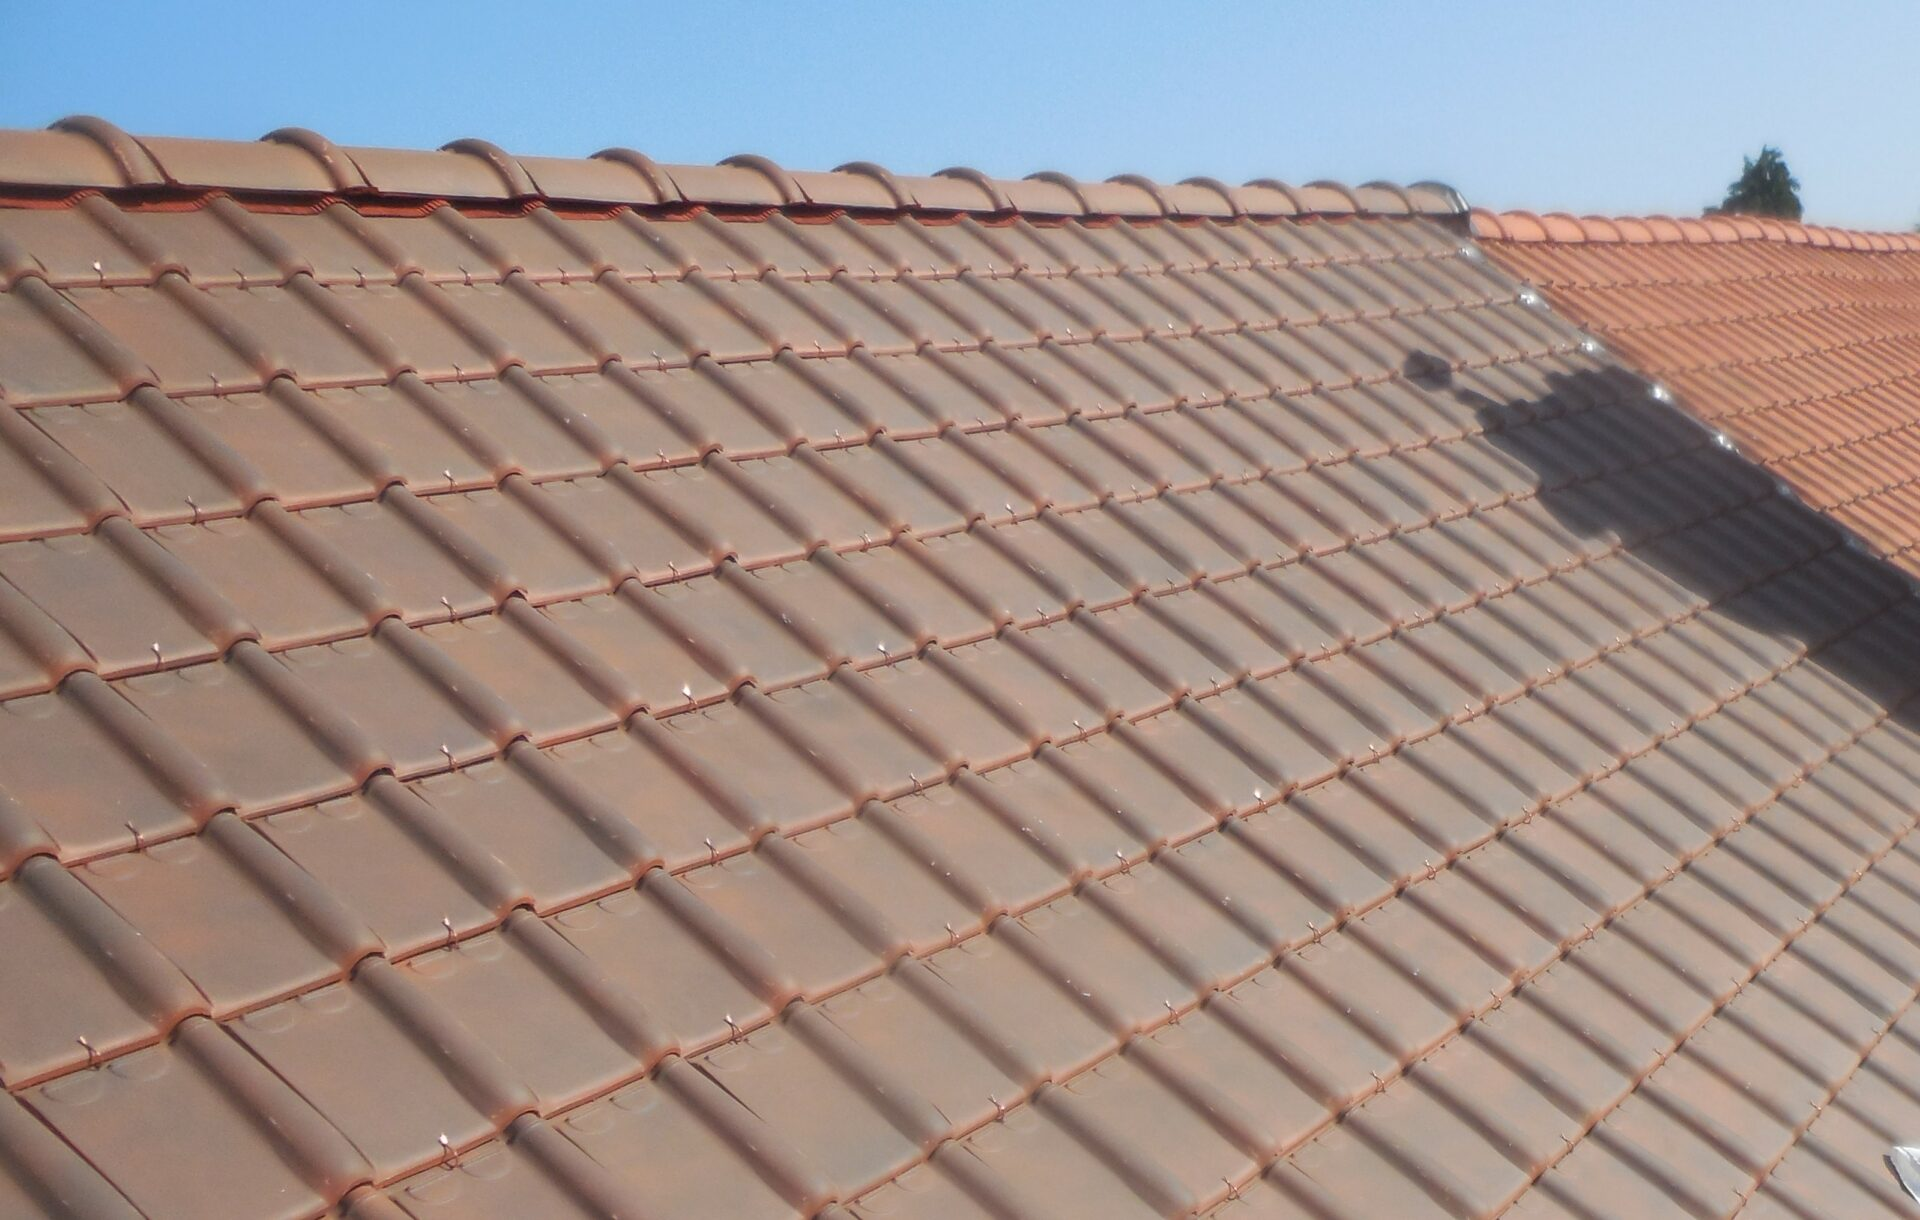 Charpente toiture | entreprise toiture | isolation toiture | réparation toiture